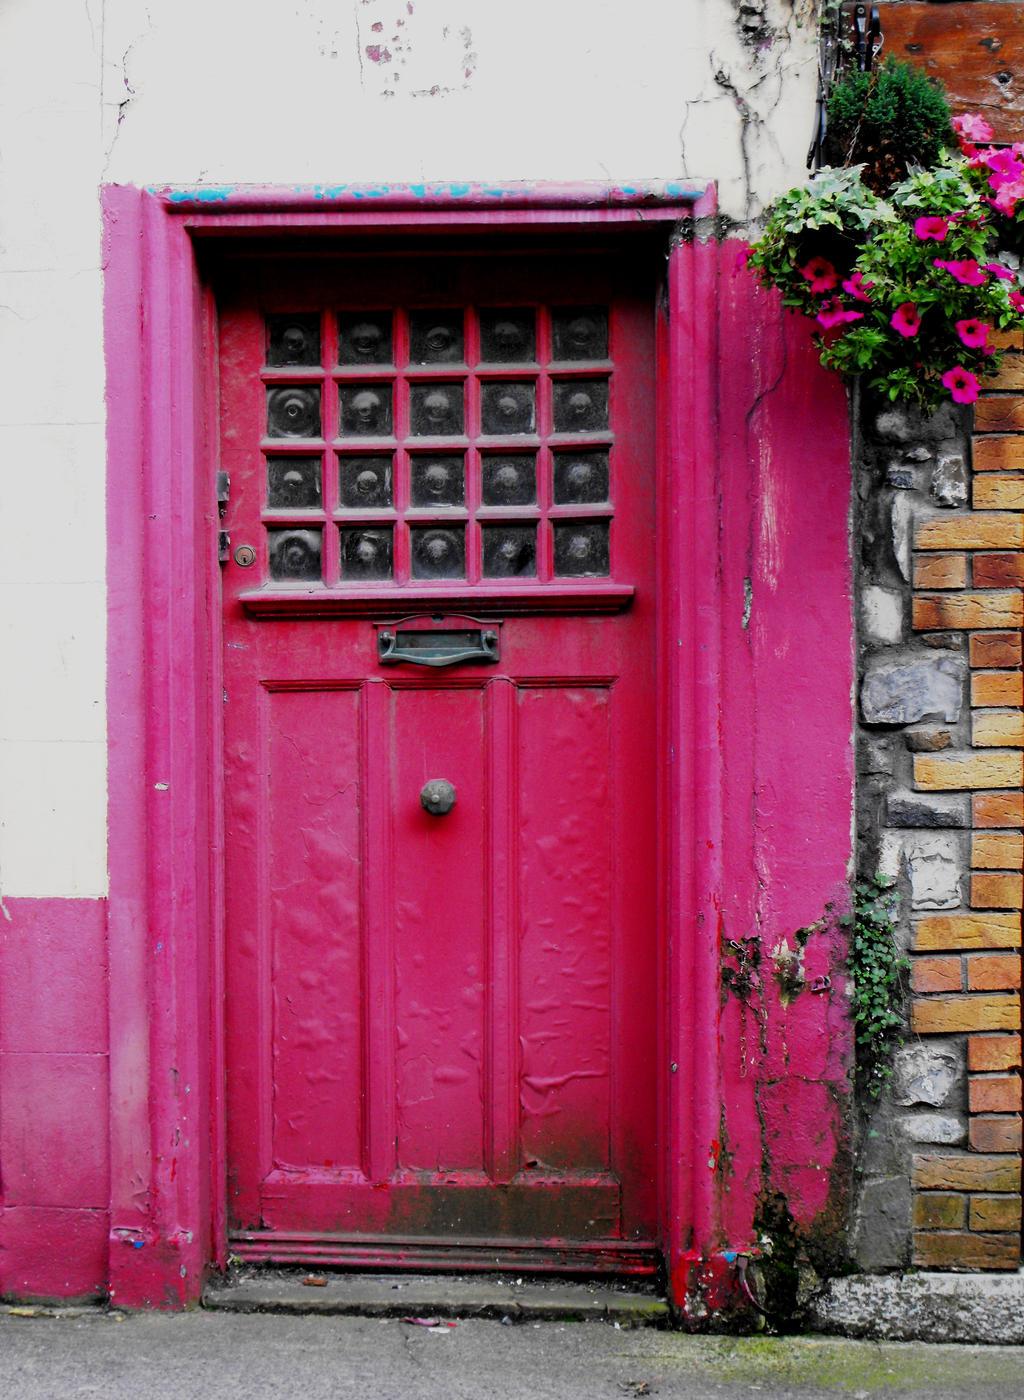 ... the pink door by edera-nys & the pink door by edera-nys on DeviantArt